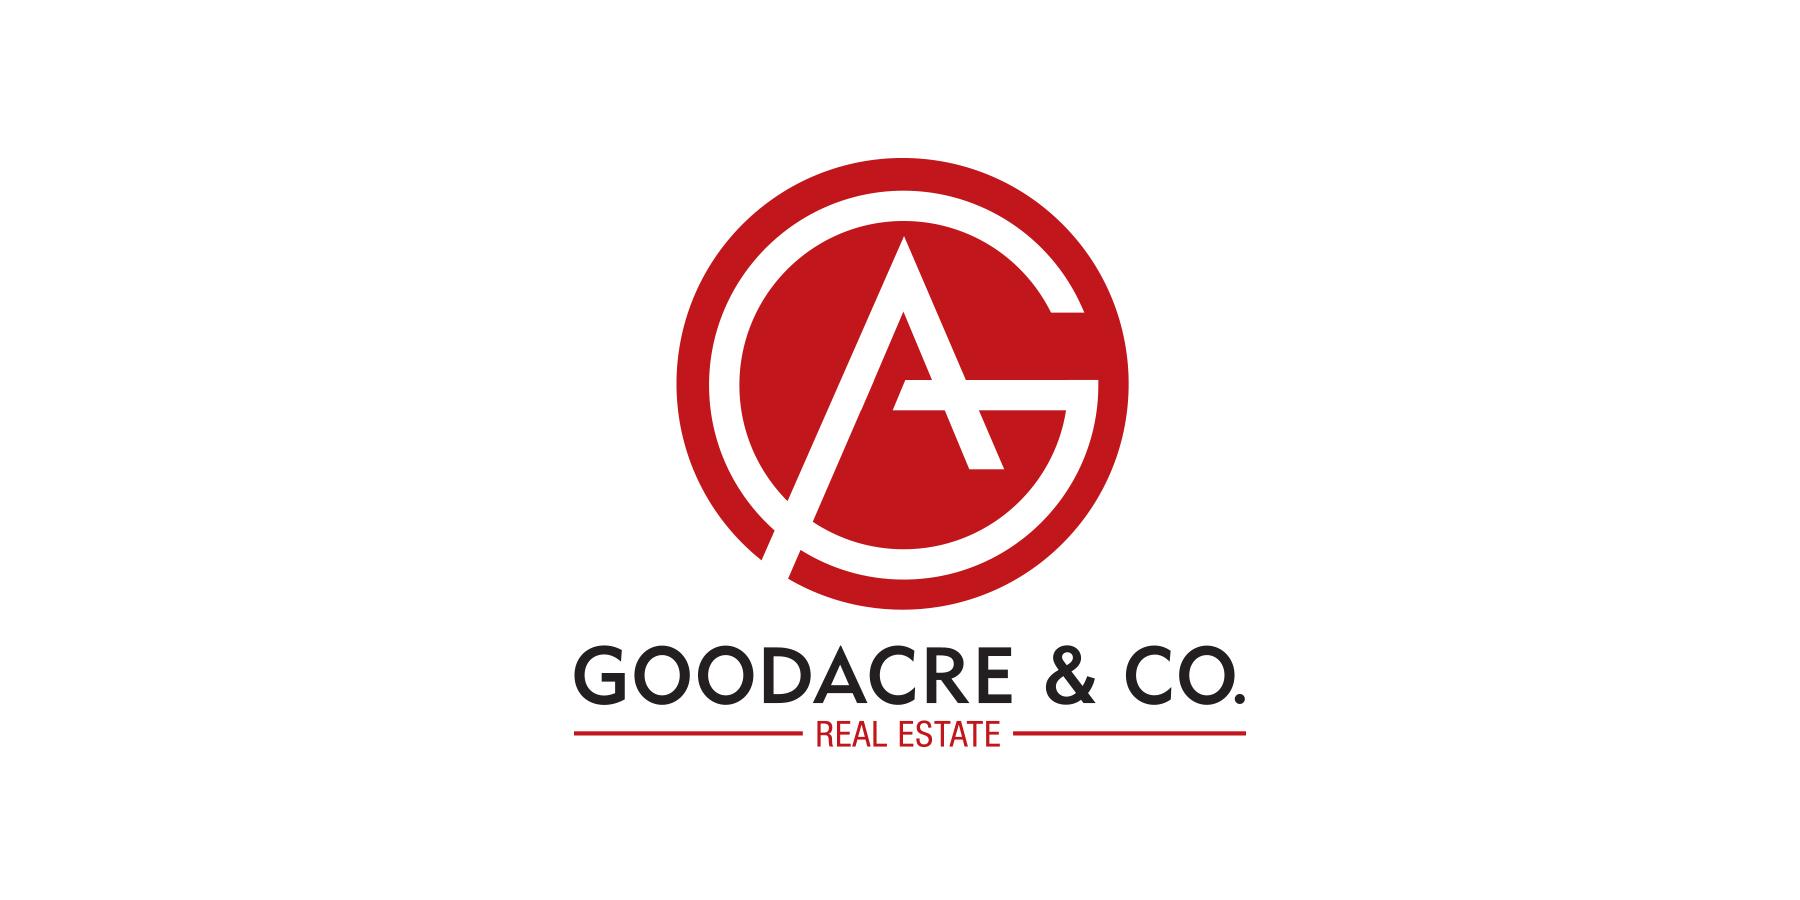 Goodachre_6x4_Logo_E.jpg